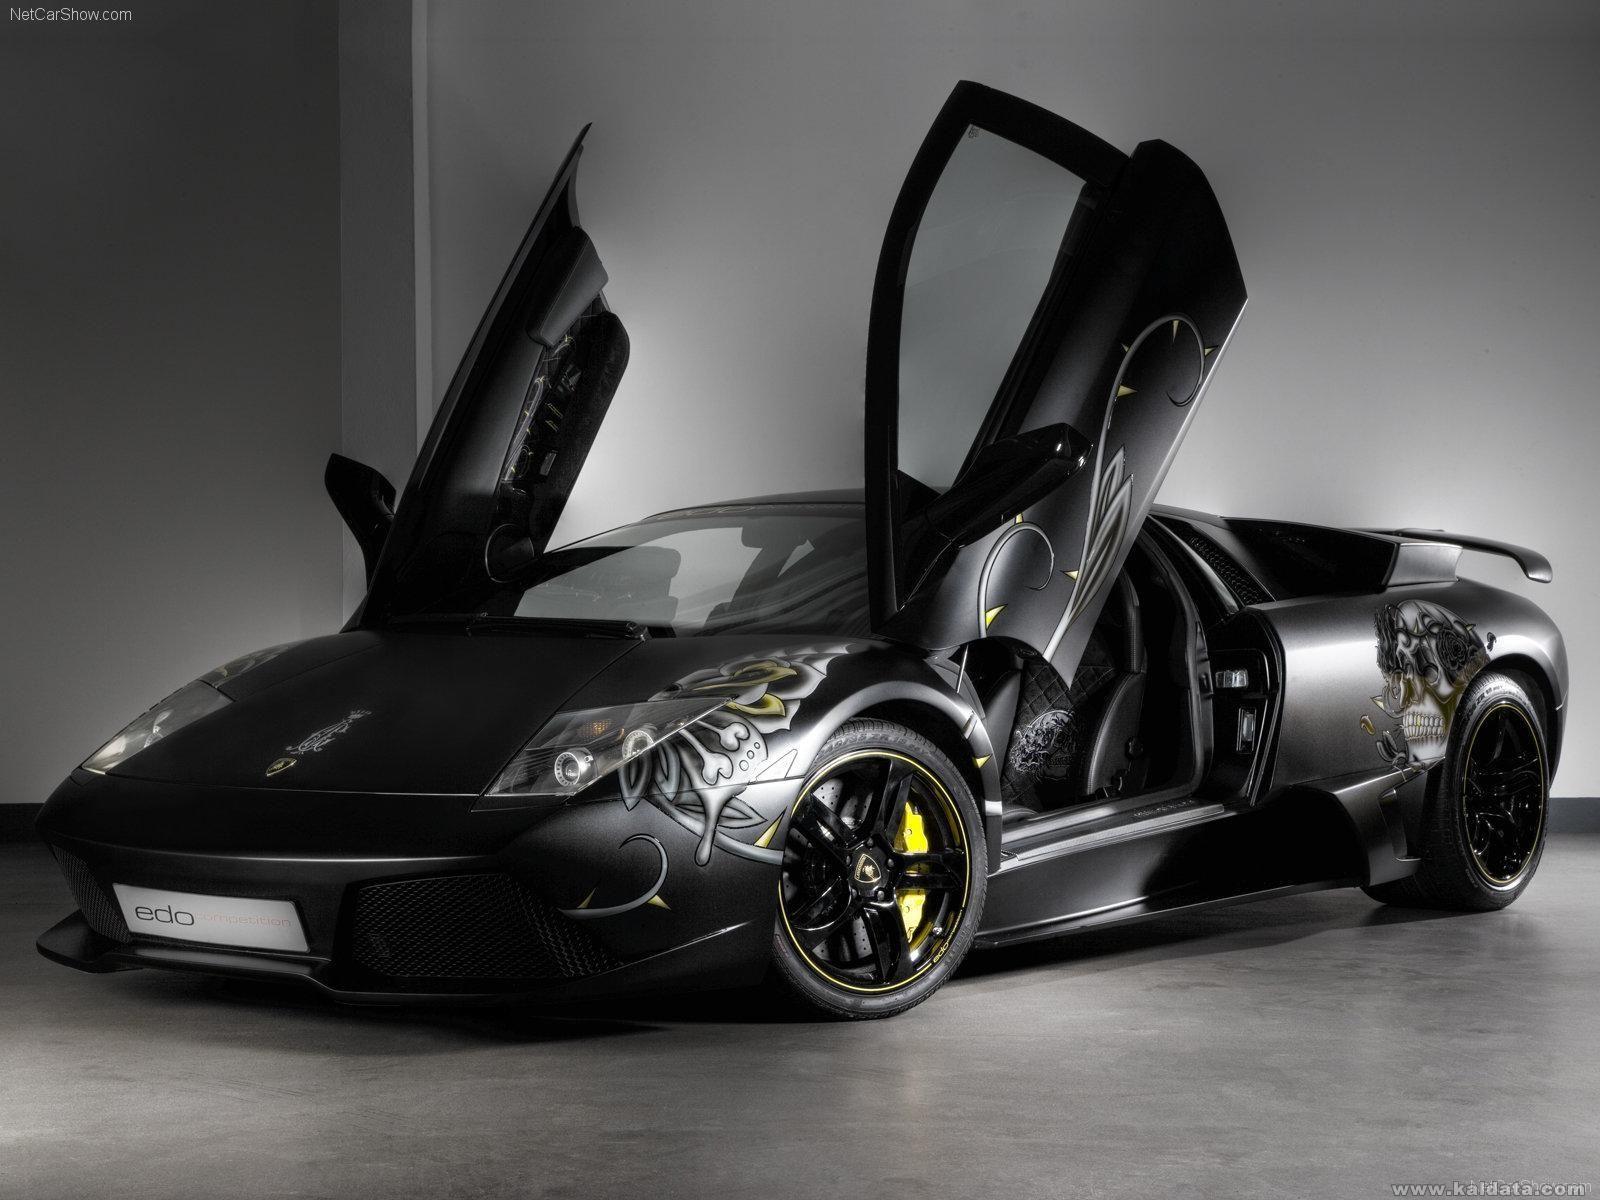 Edo-Lamborghini_Murcielago_LP710_Audigier_2009_1600x1200_wal